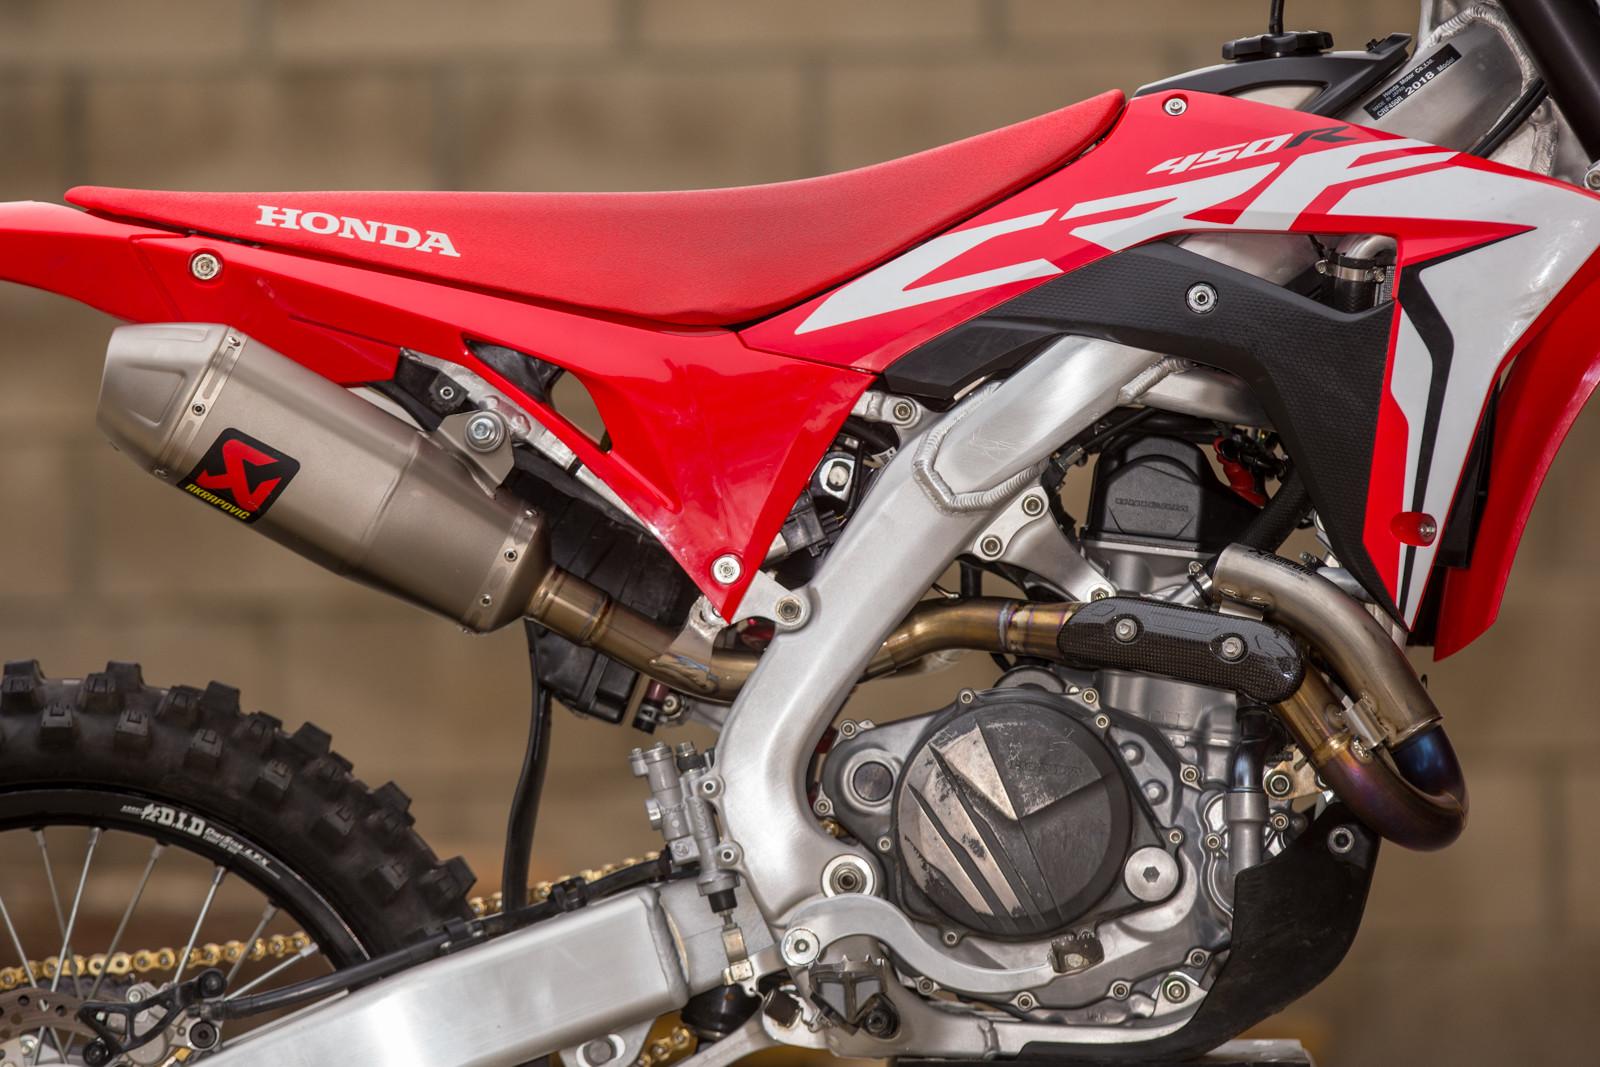 Vital MX Shootout: The Best Honda CRF450R Exhaust System